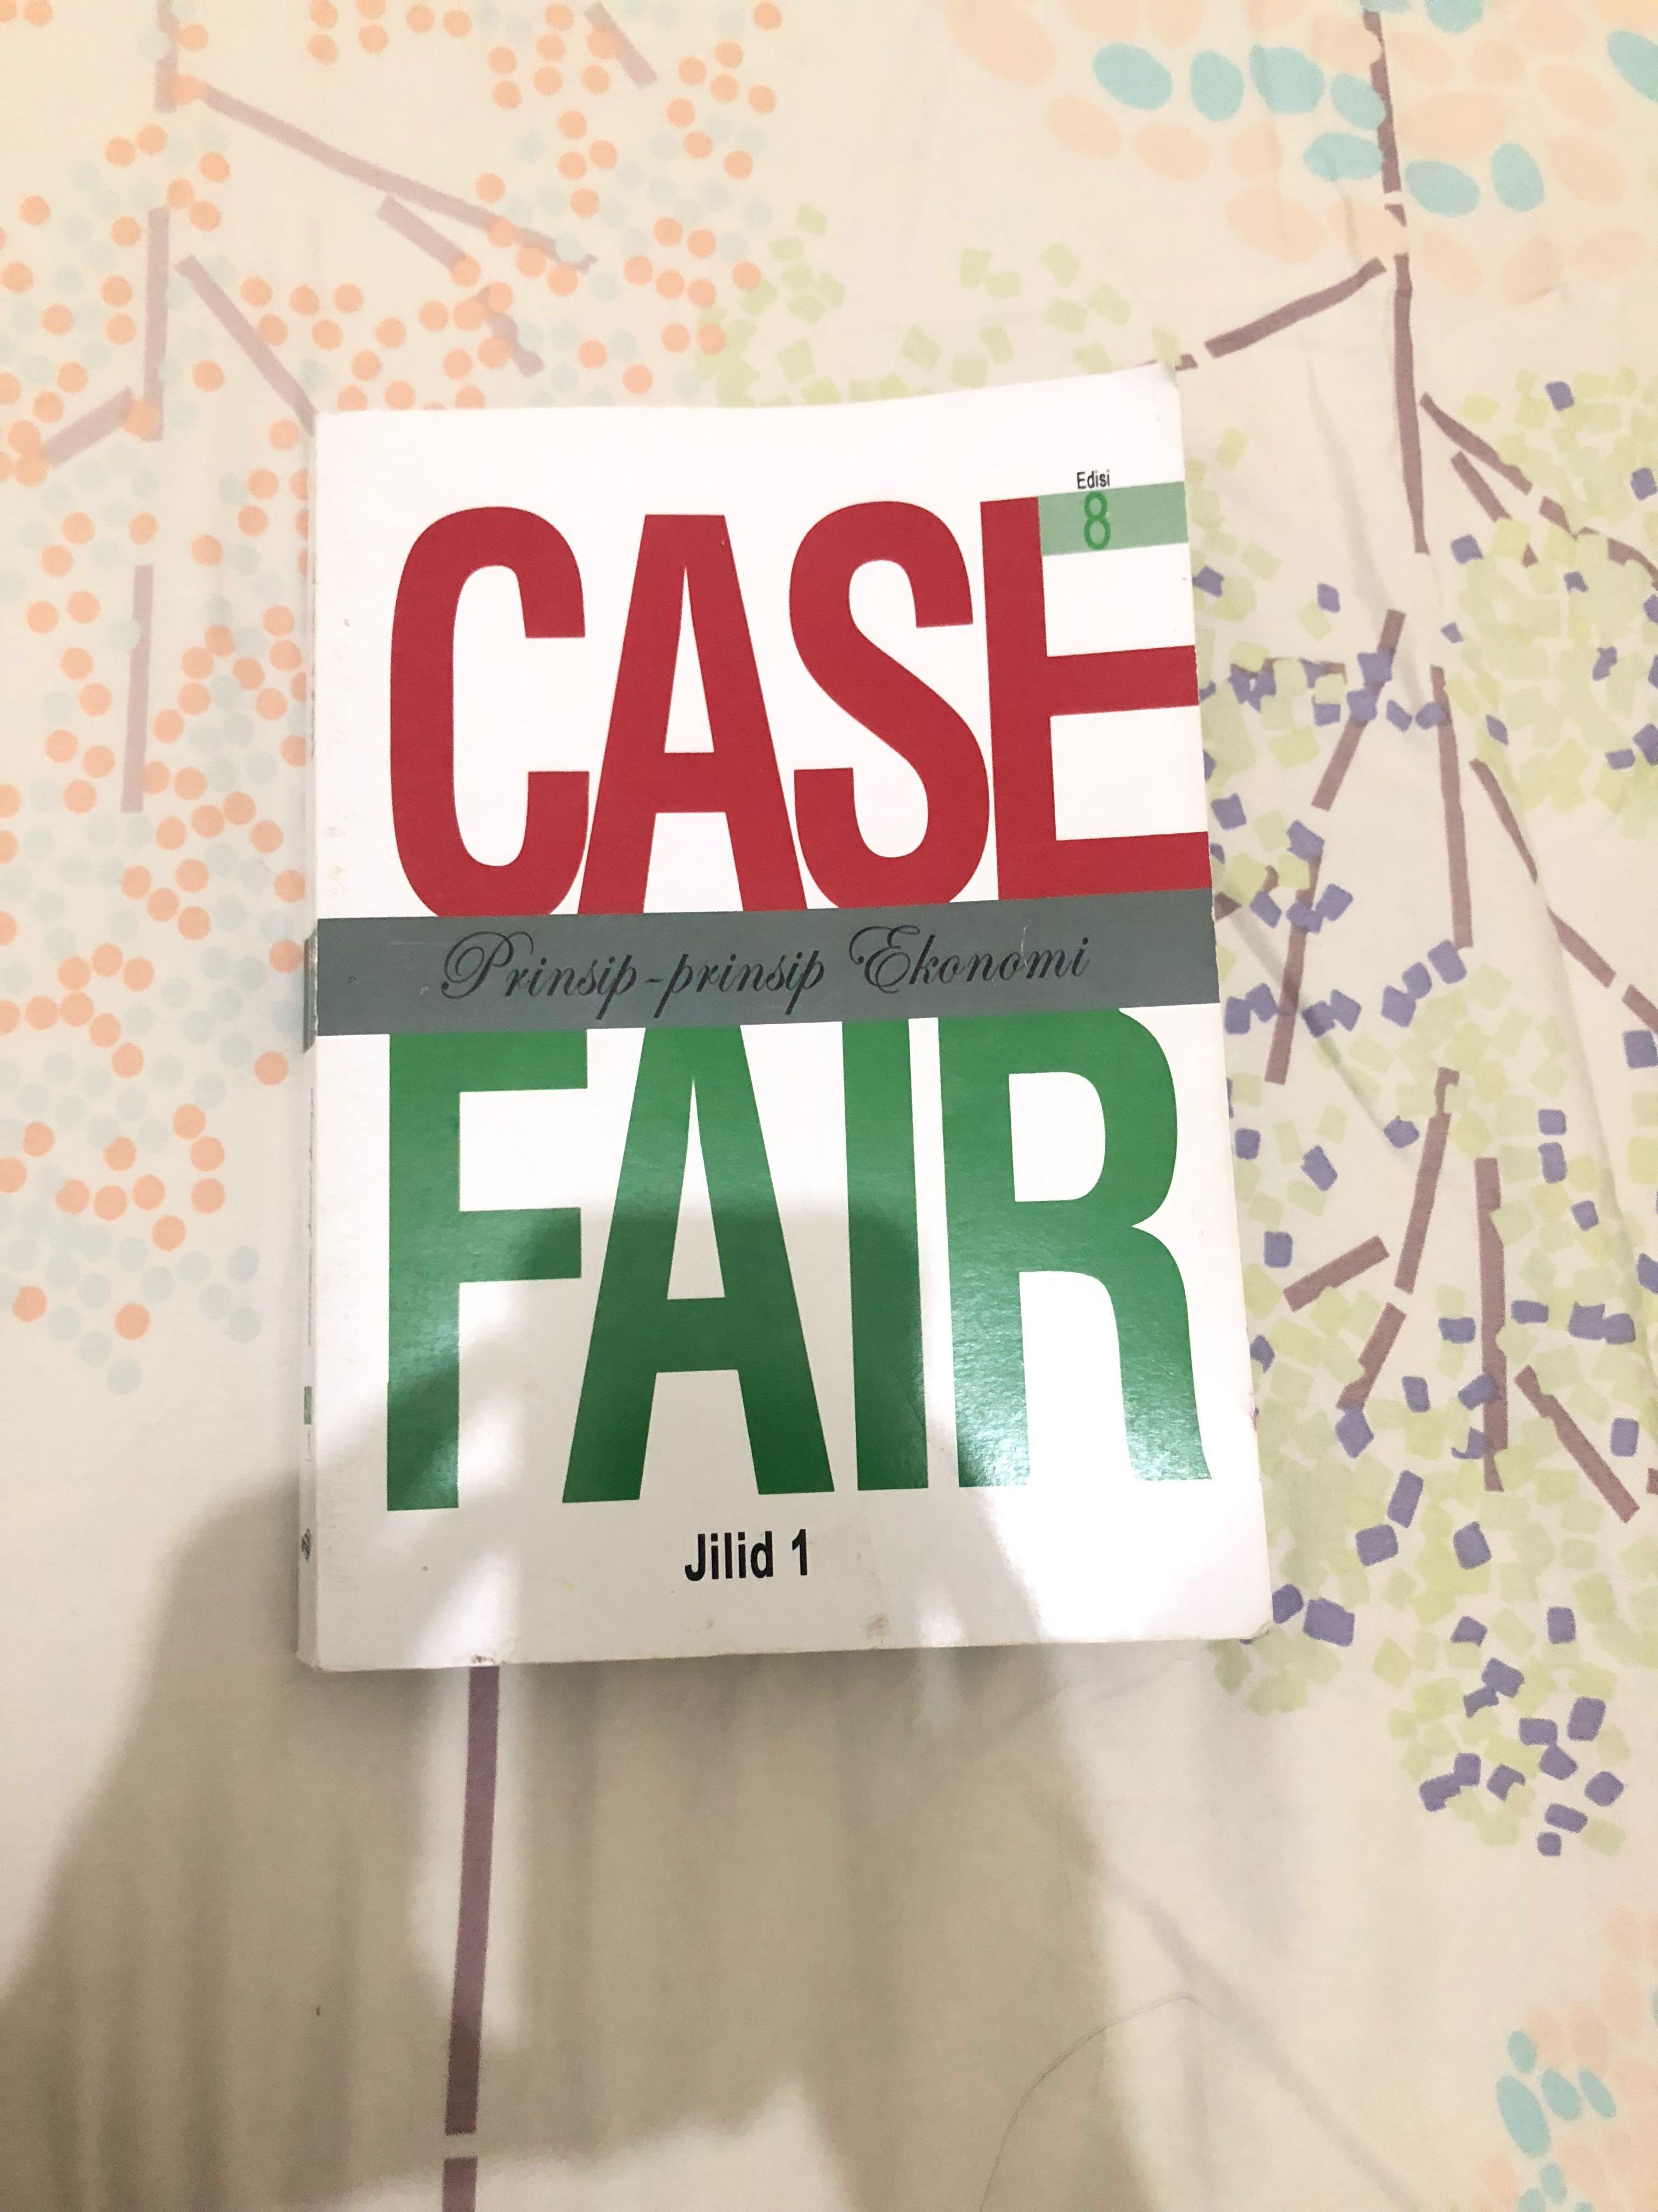 Prinsip-prinsip ekonomi case fair jilid 1